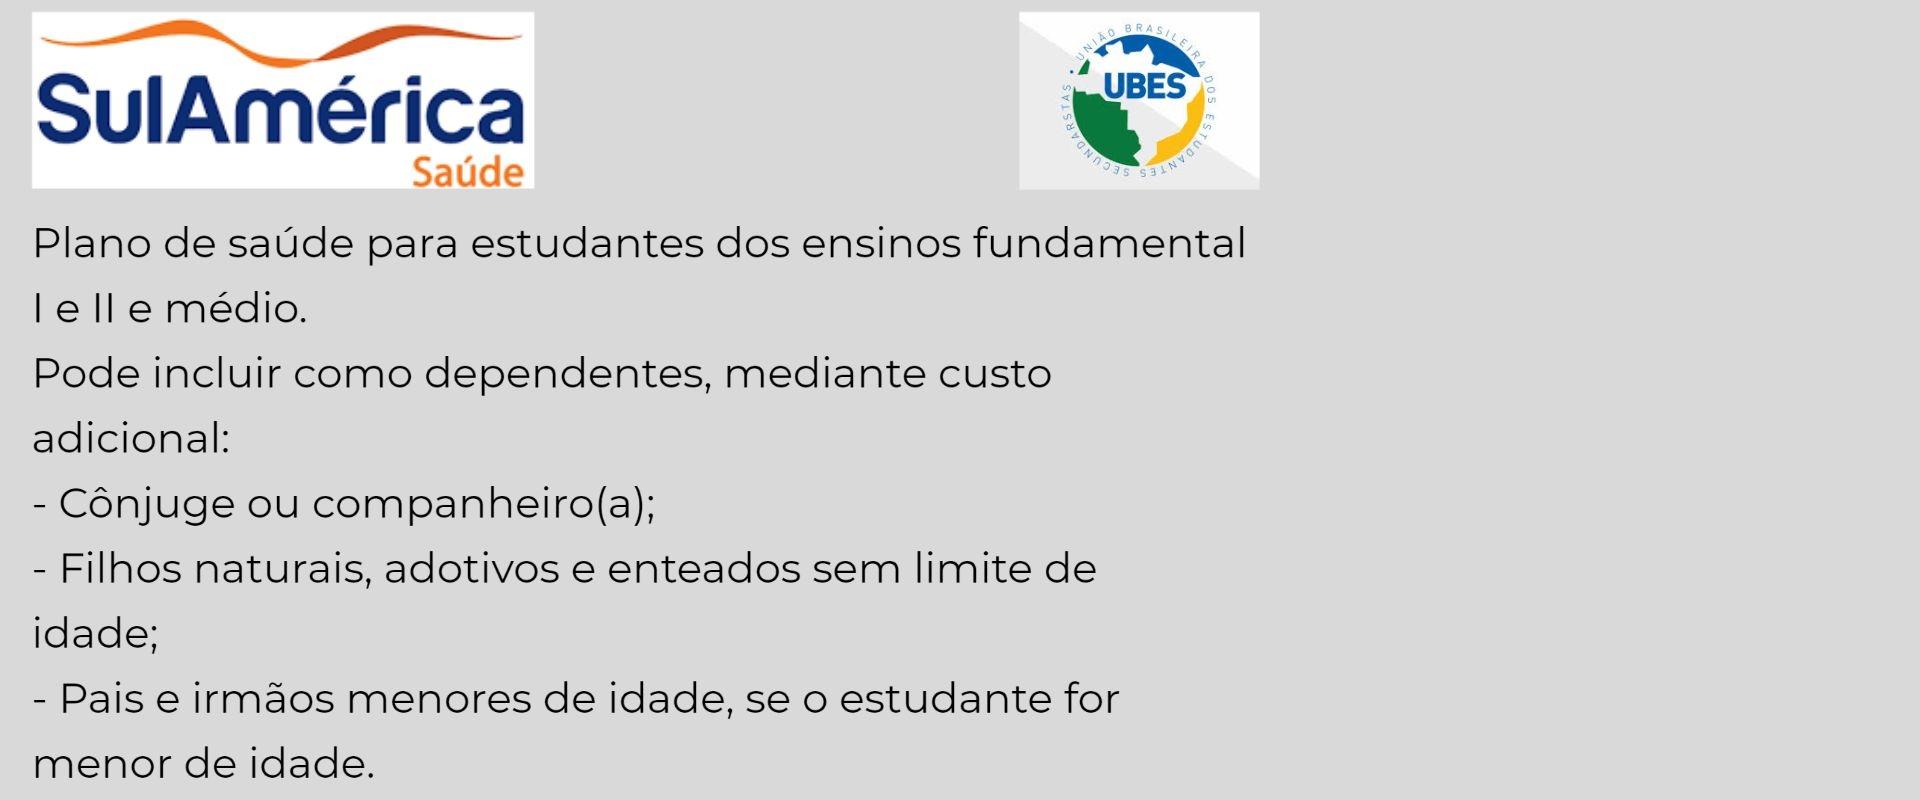 Sul América UBES-MG